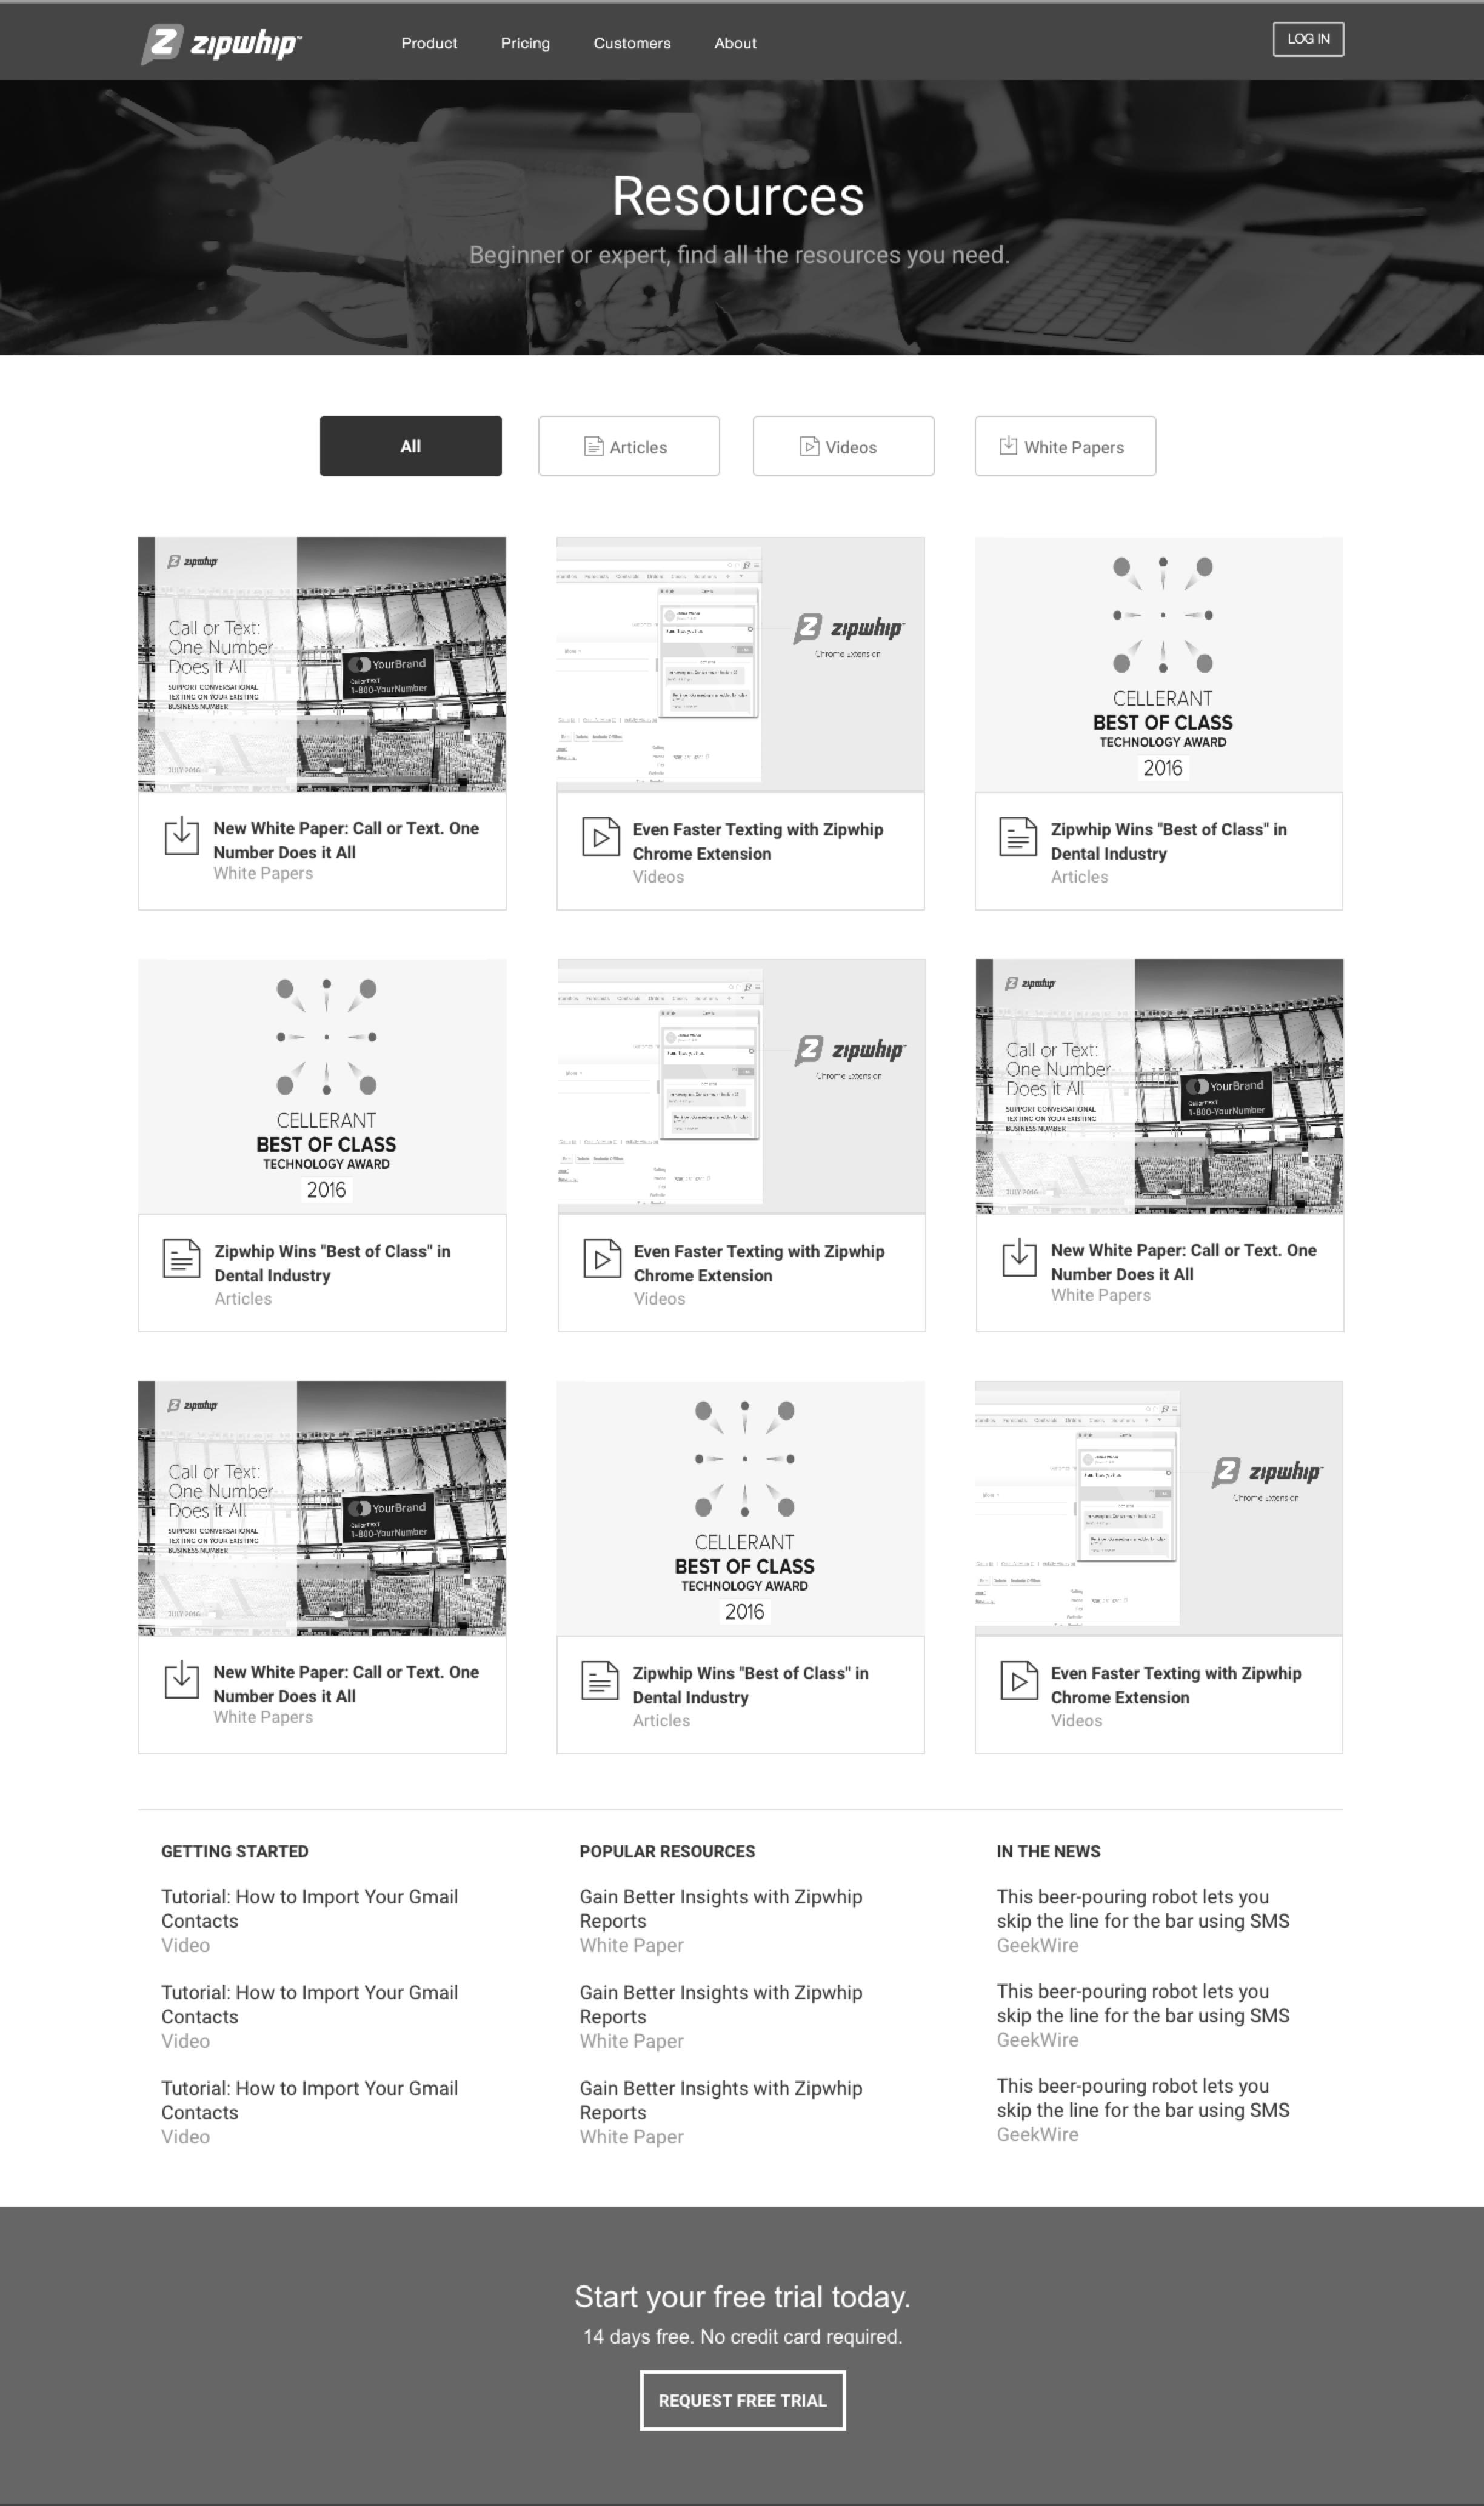 Resources - Index View